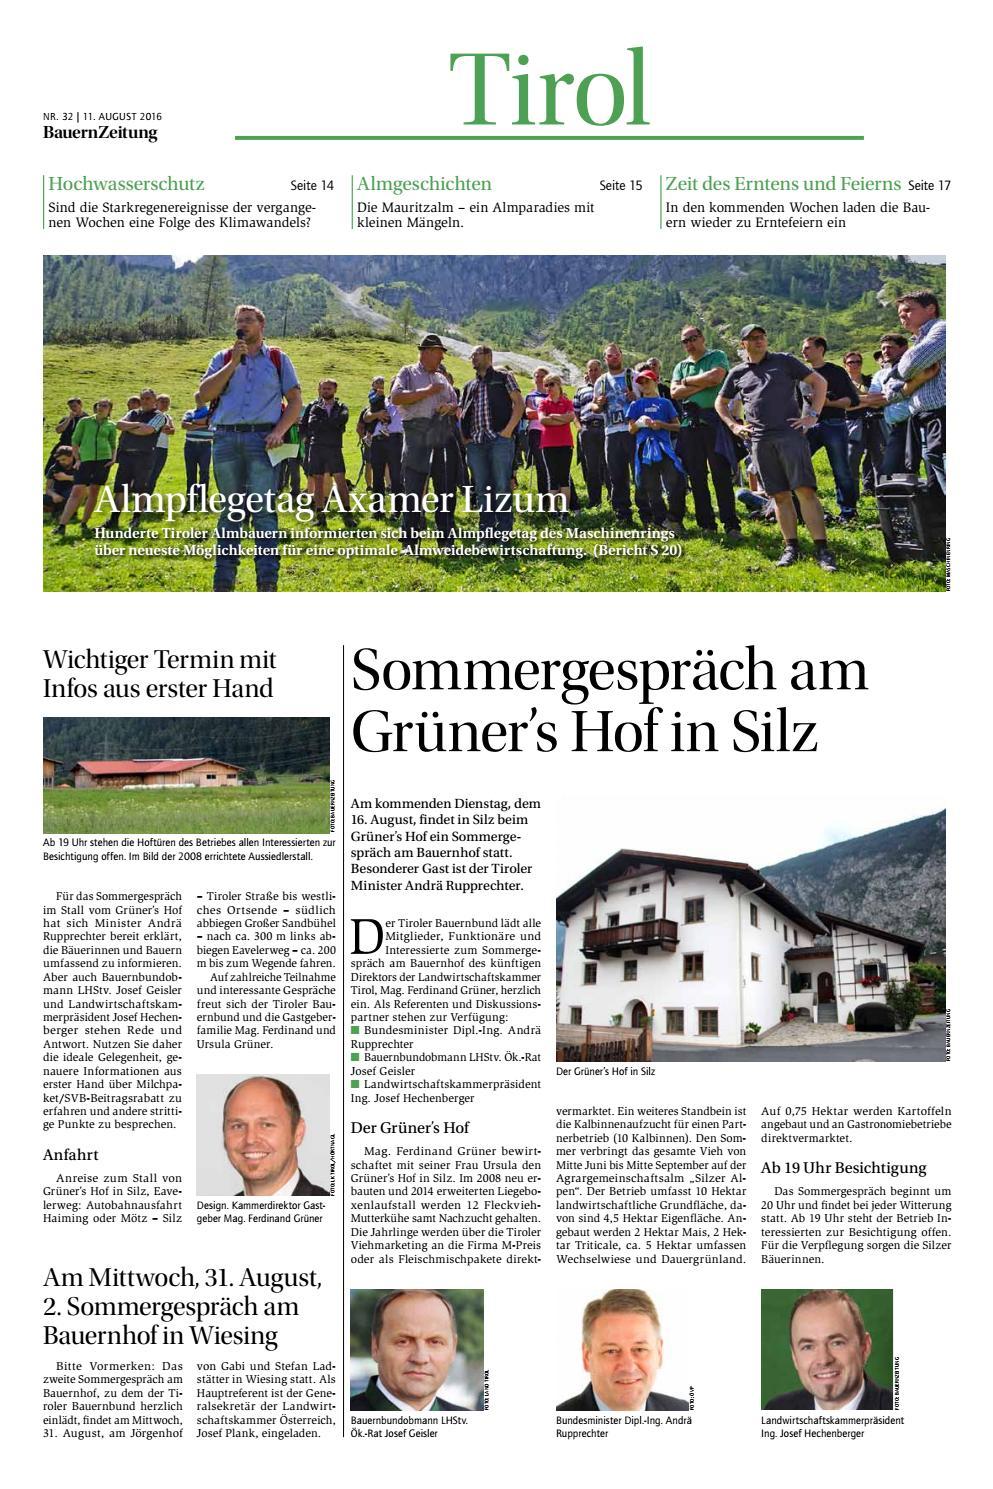 Single kino aus silz - Partnersuche feldkirchen an der donau